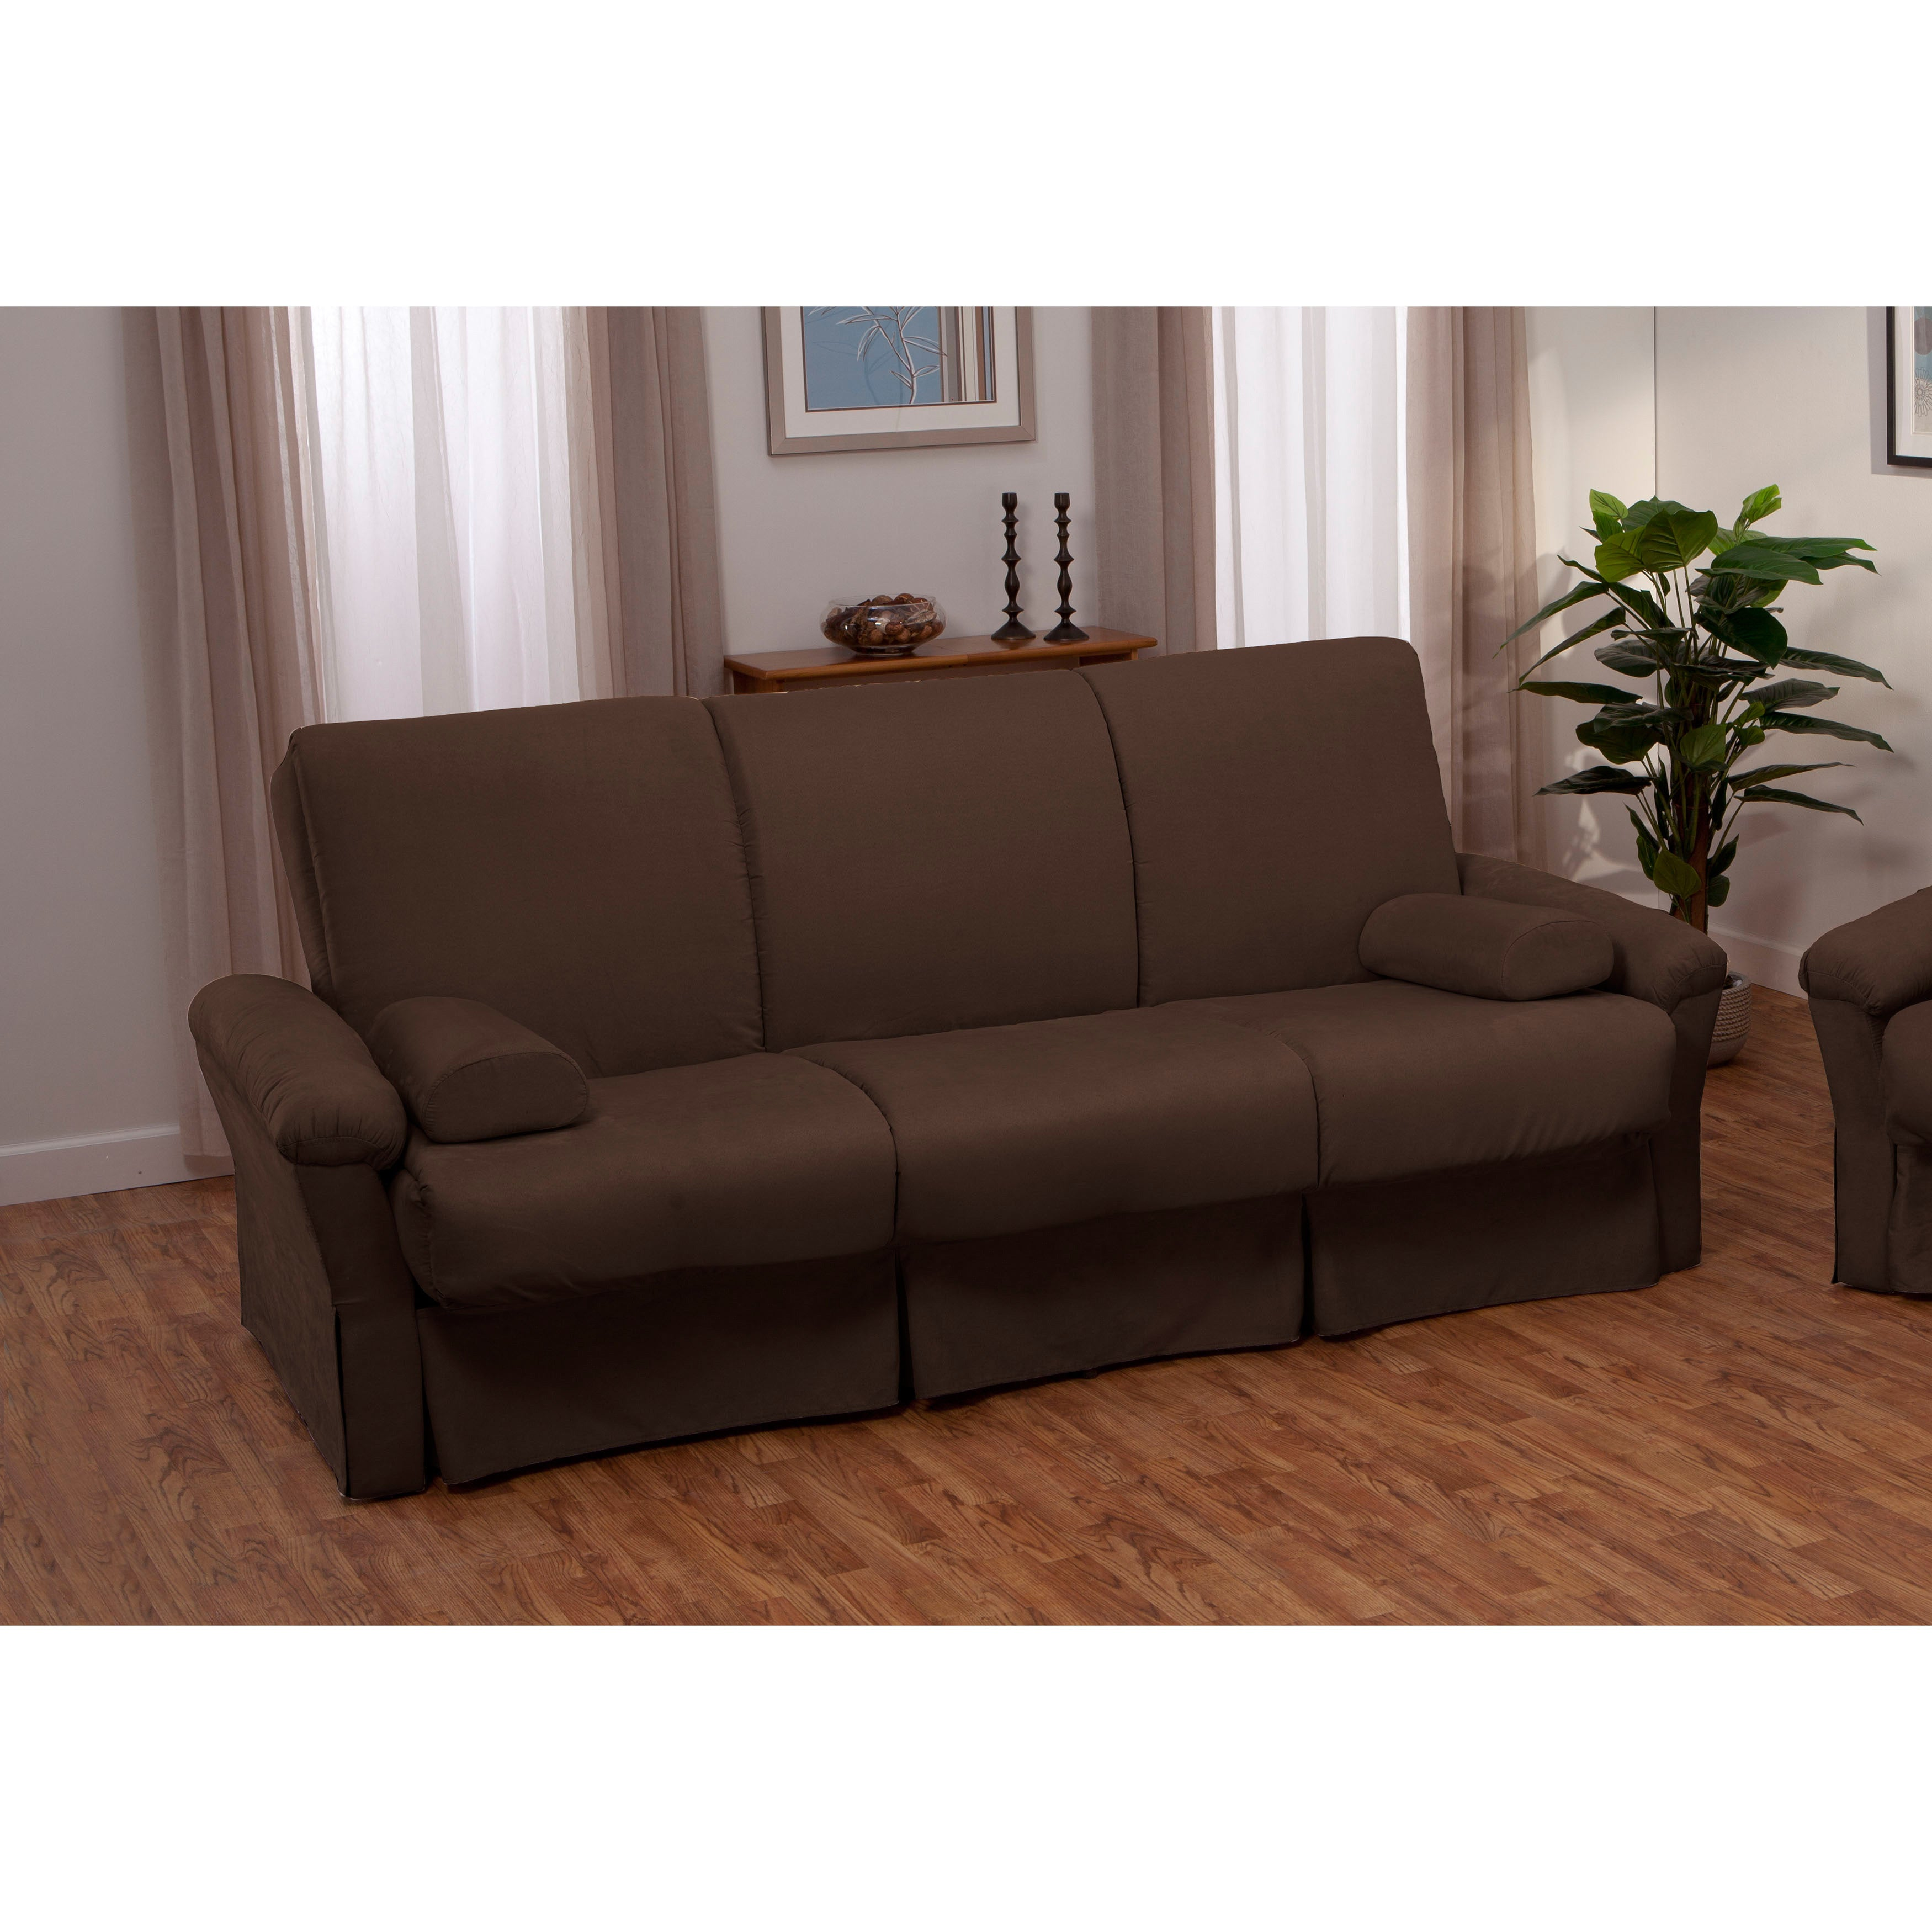 Sofa Set Size: Pine Canopy Tuskegee Sleeper Sofa Set